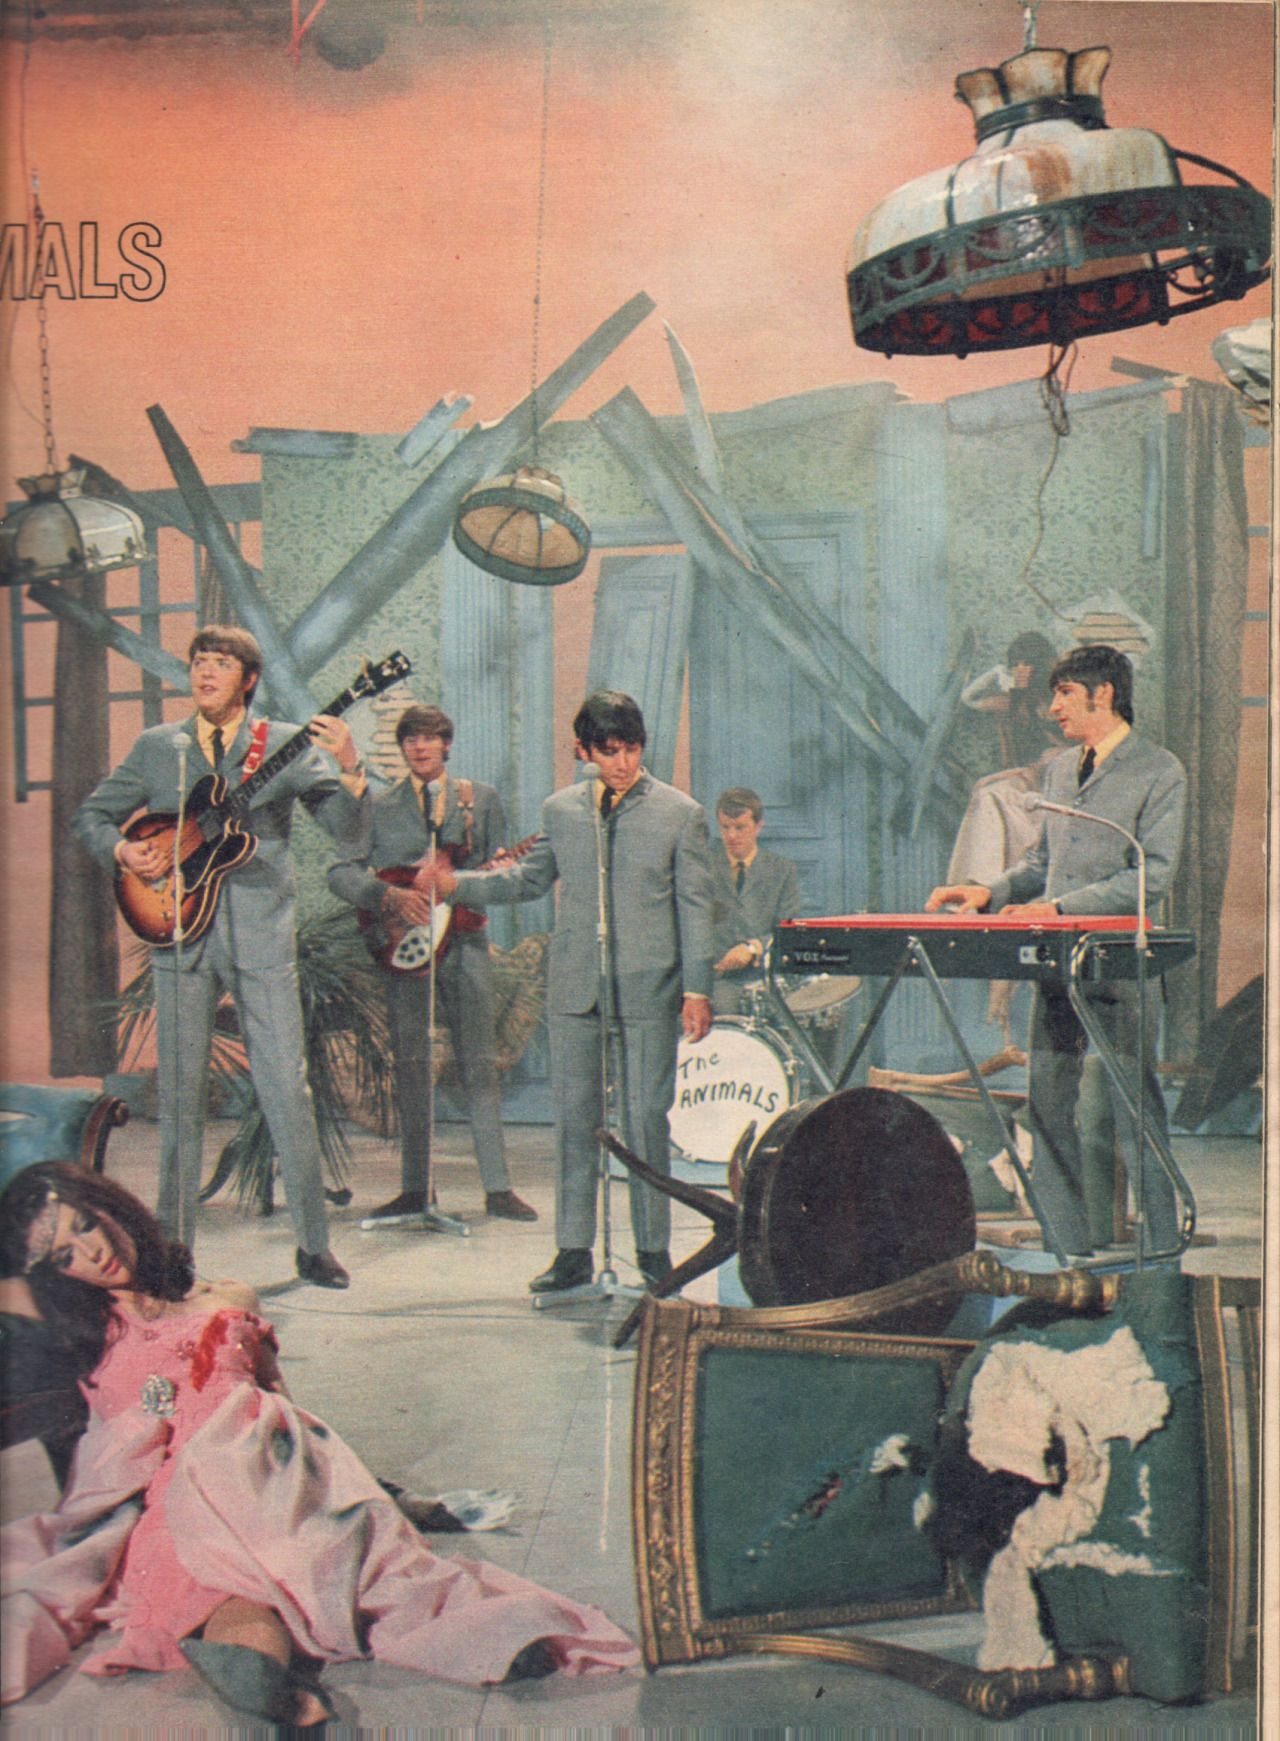 Pin on Eric Burdon .. The House of the Rising Sun 1964